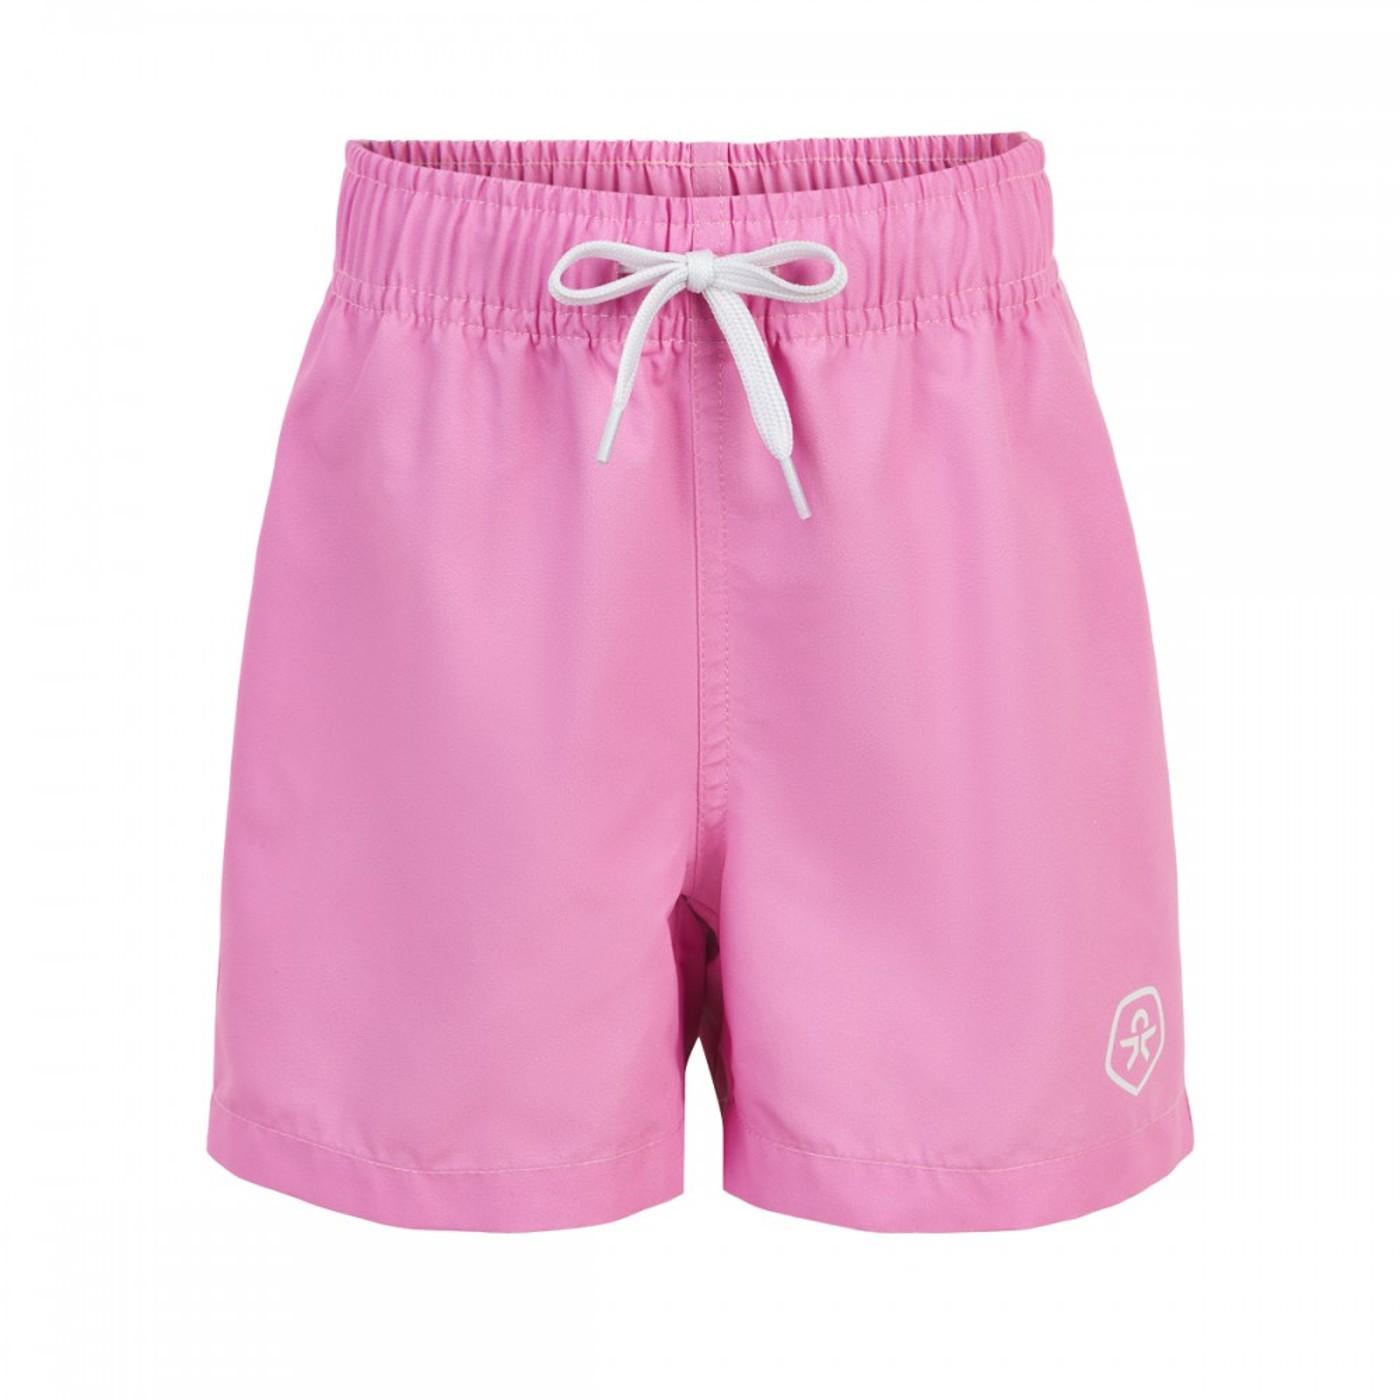 COLOR Bungo beach shorts - Kinder